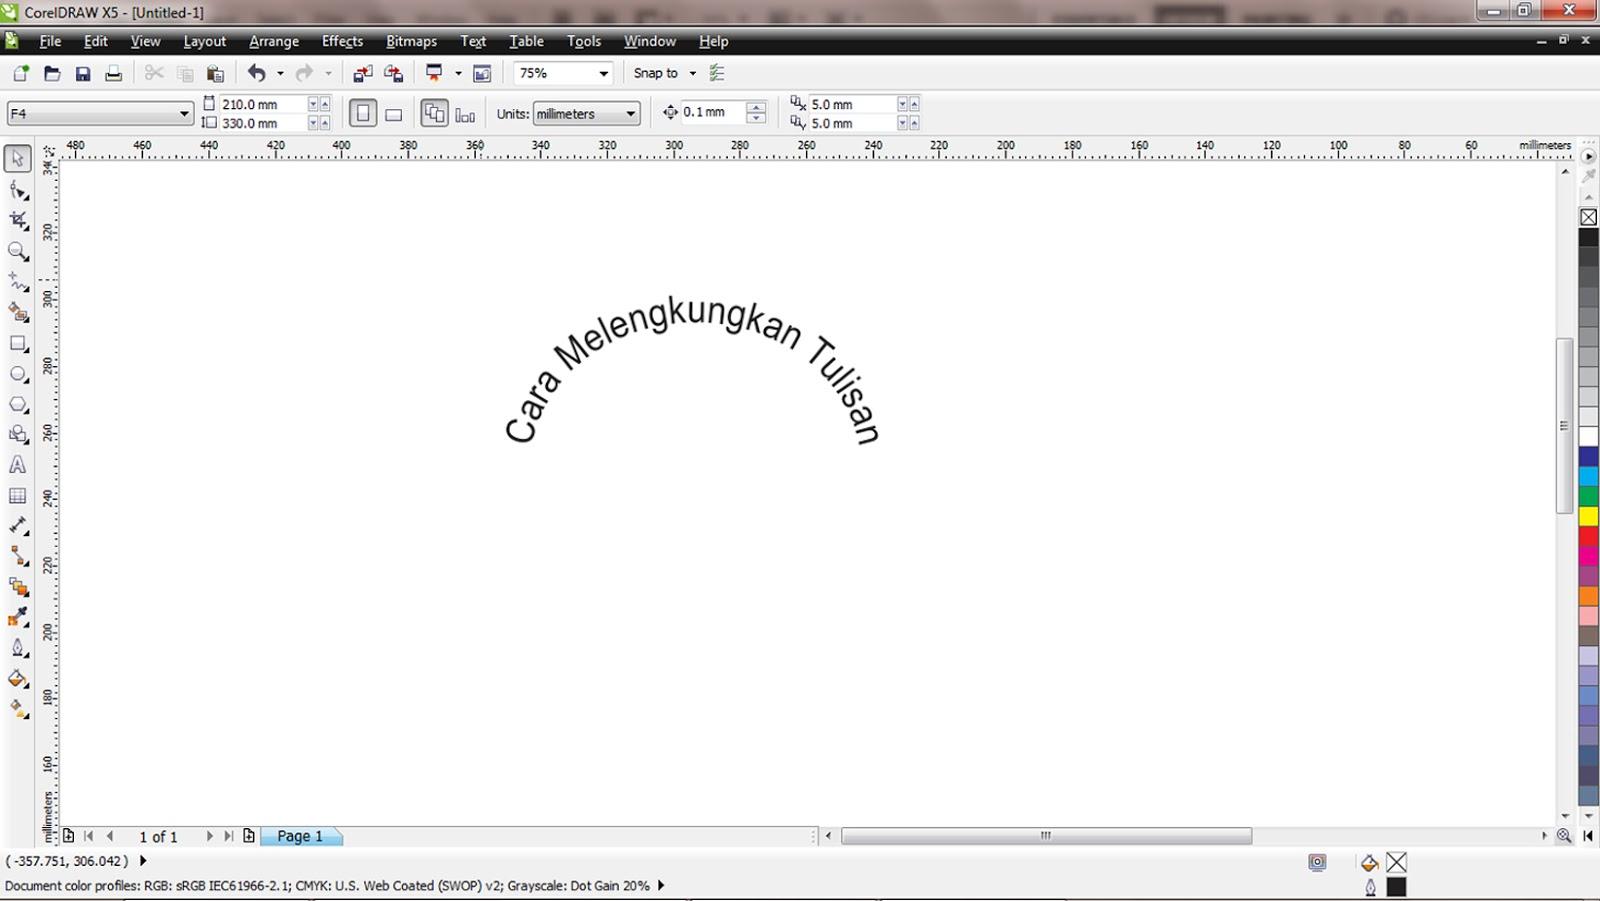 Cara melengkungkan tulisan di corel